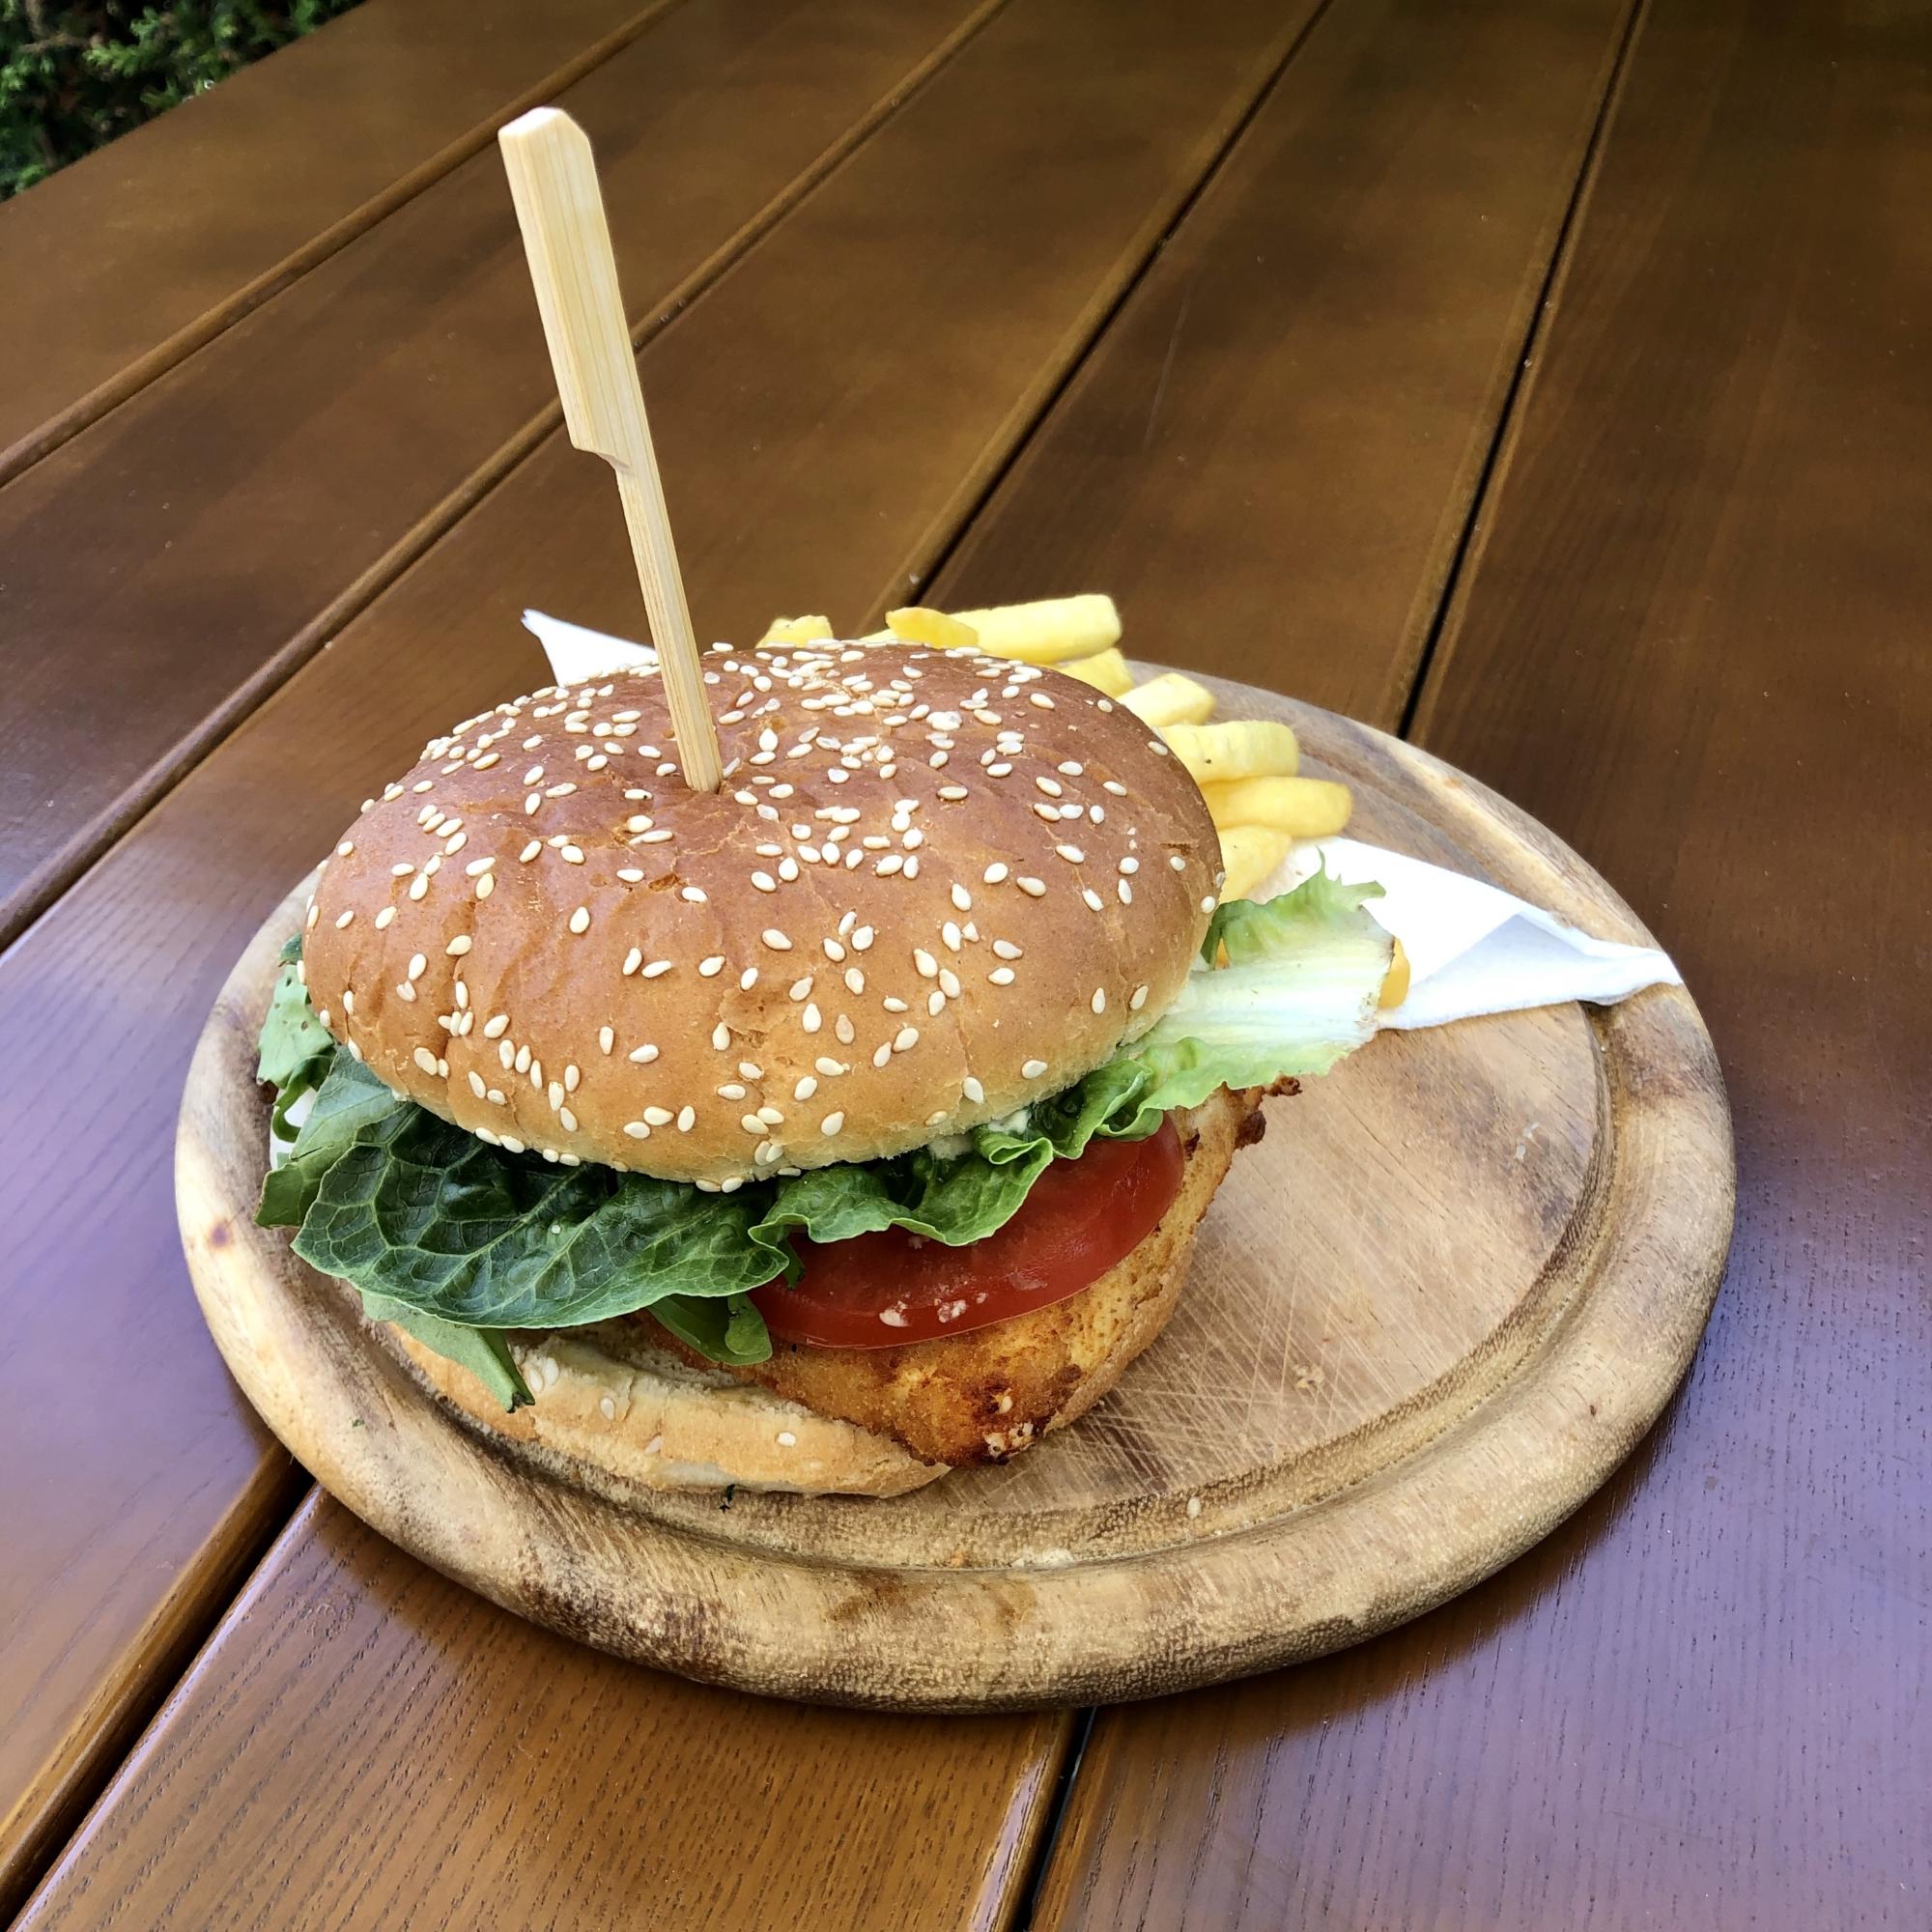 Grieche-Wedel-Taverna-Plaka-Saganaki-Burger vegetarisch